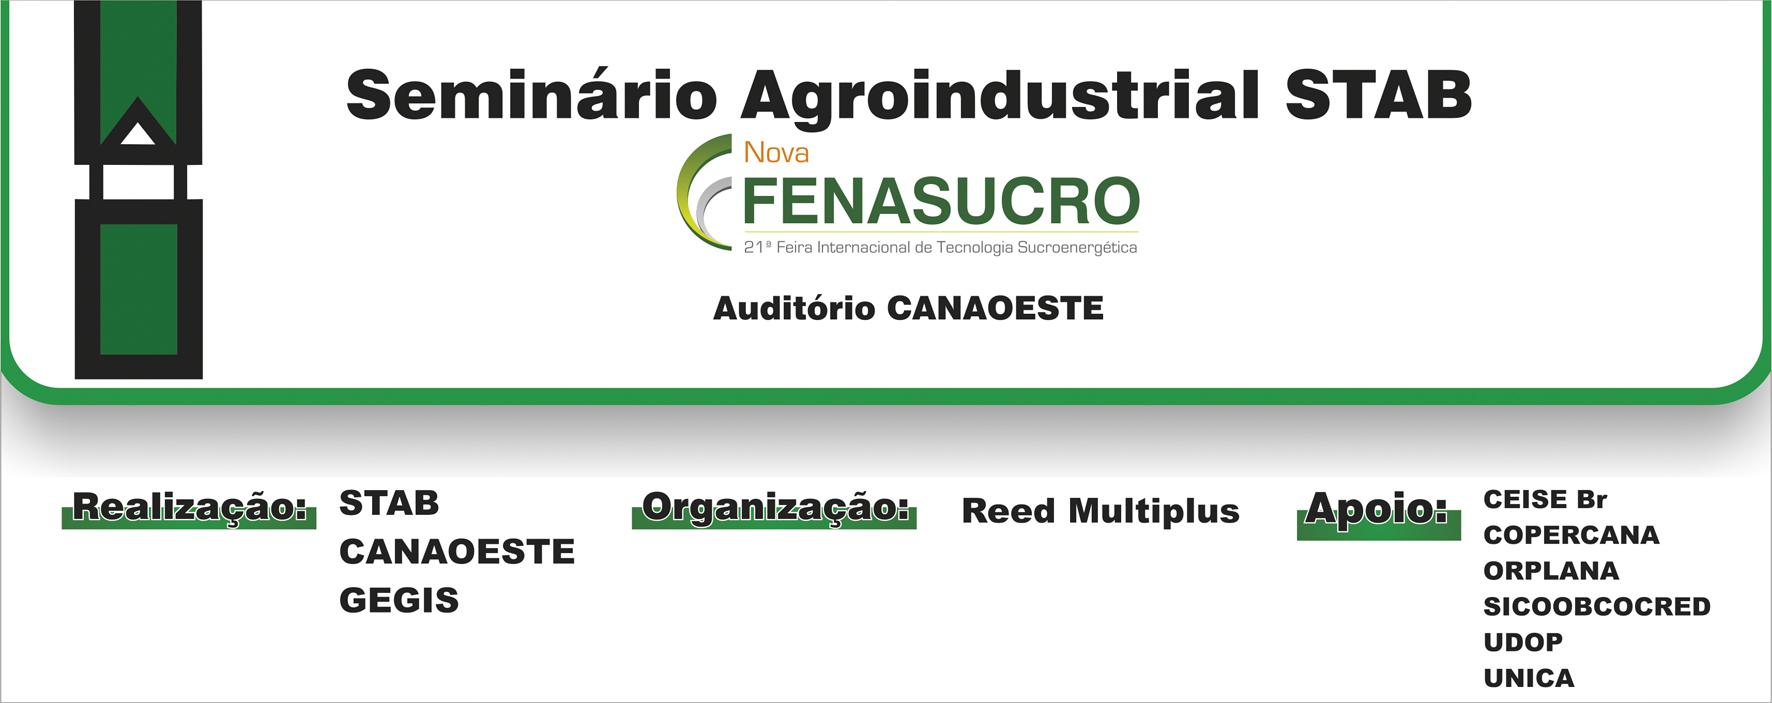 Seminário Agroindustrial STAB 2013